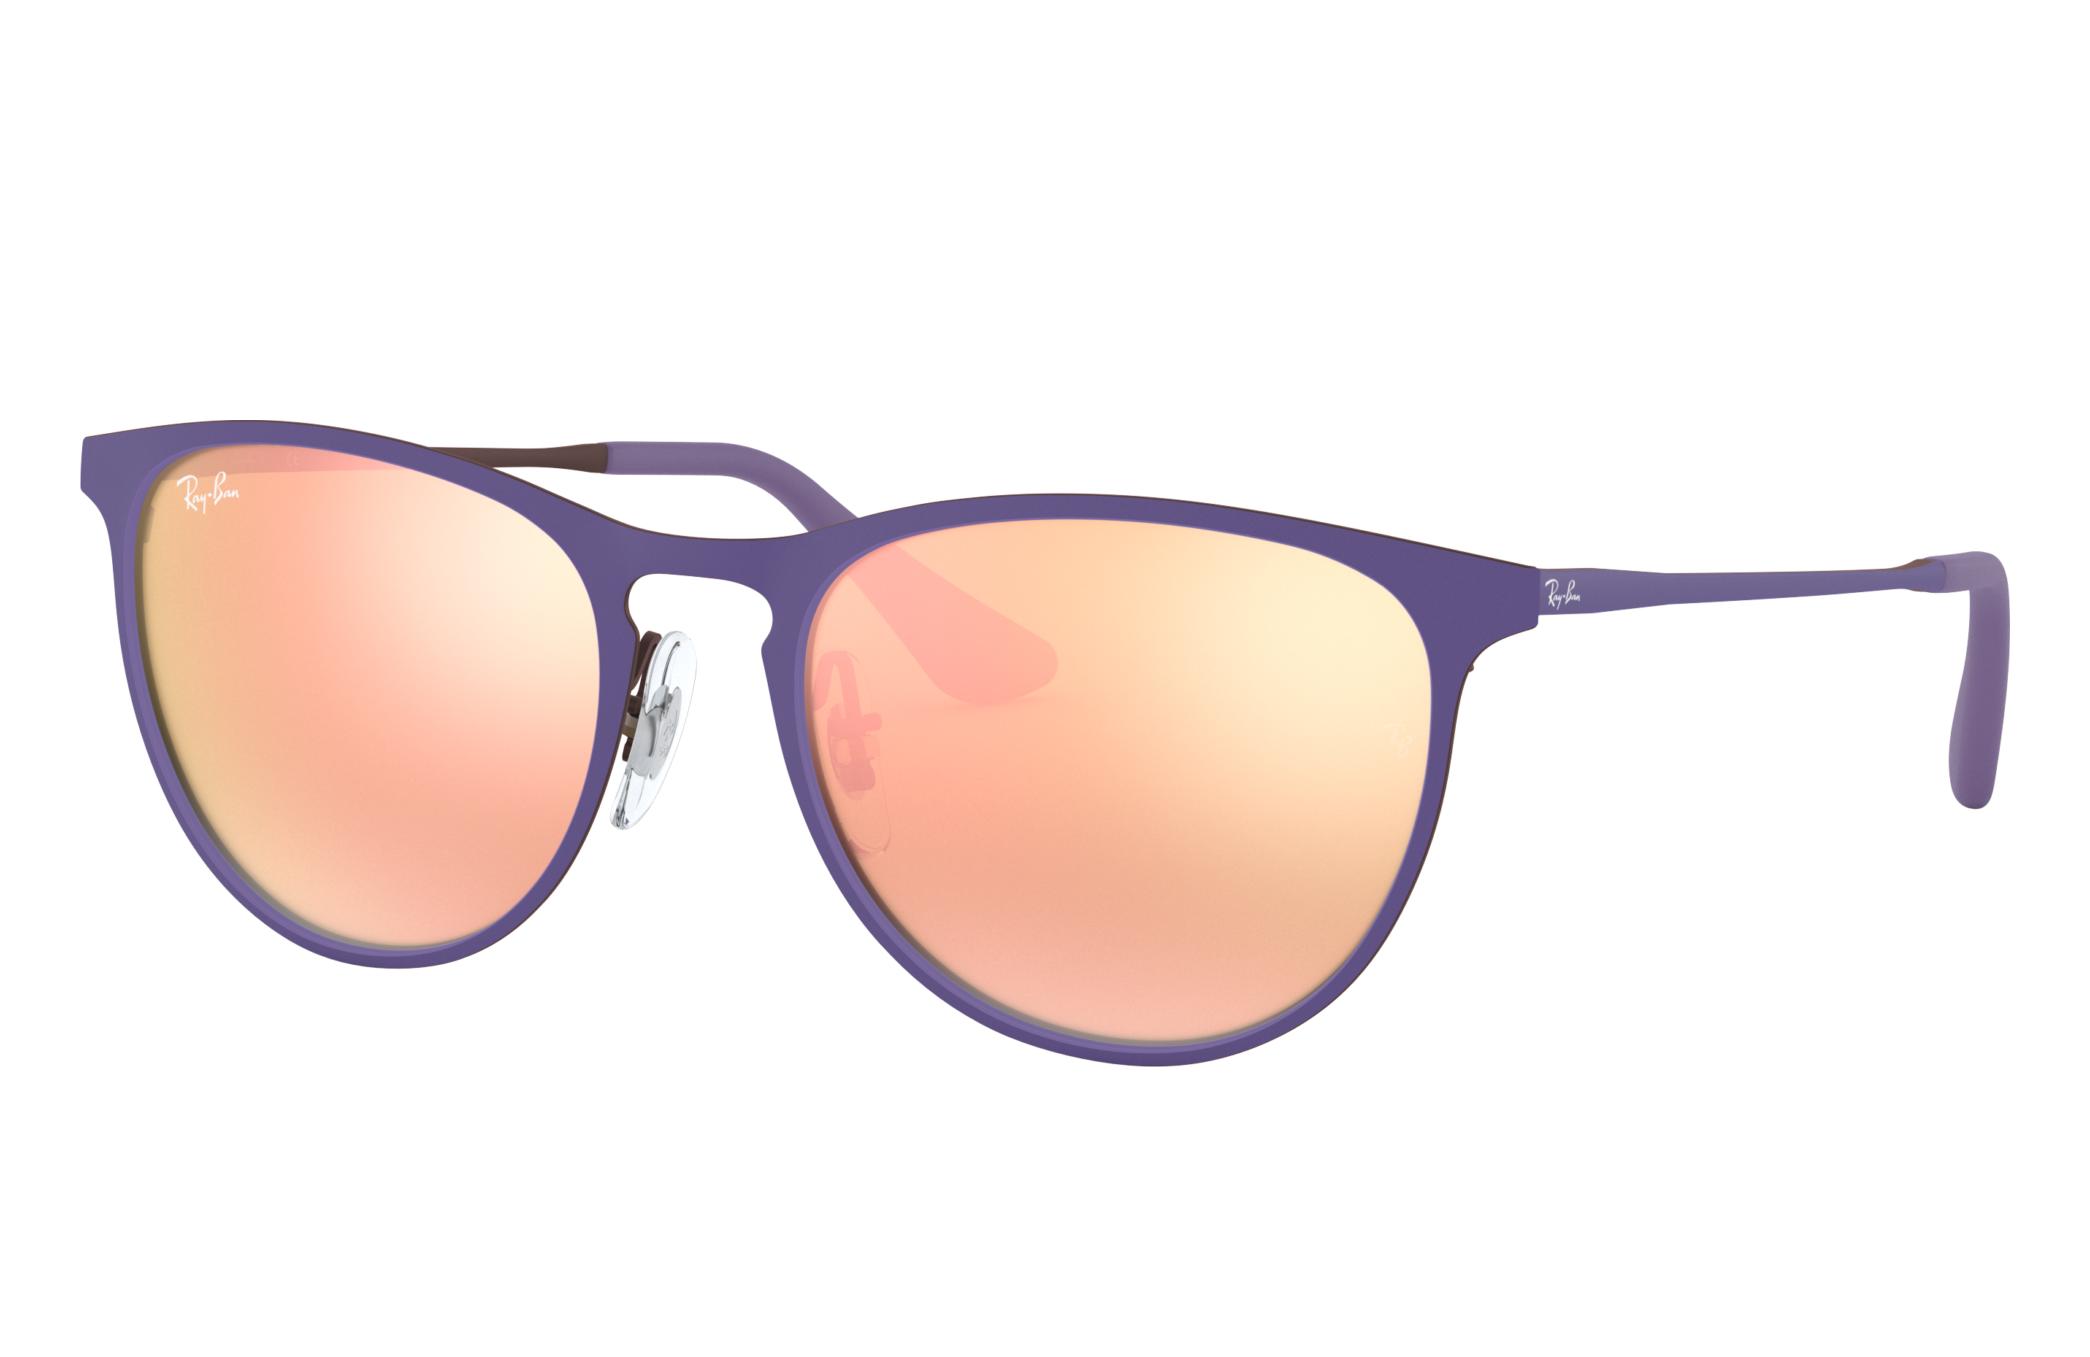 Ray-Ban Erika Metal Junior Violet, Pink Lenses - RJ9538S